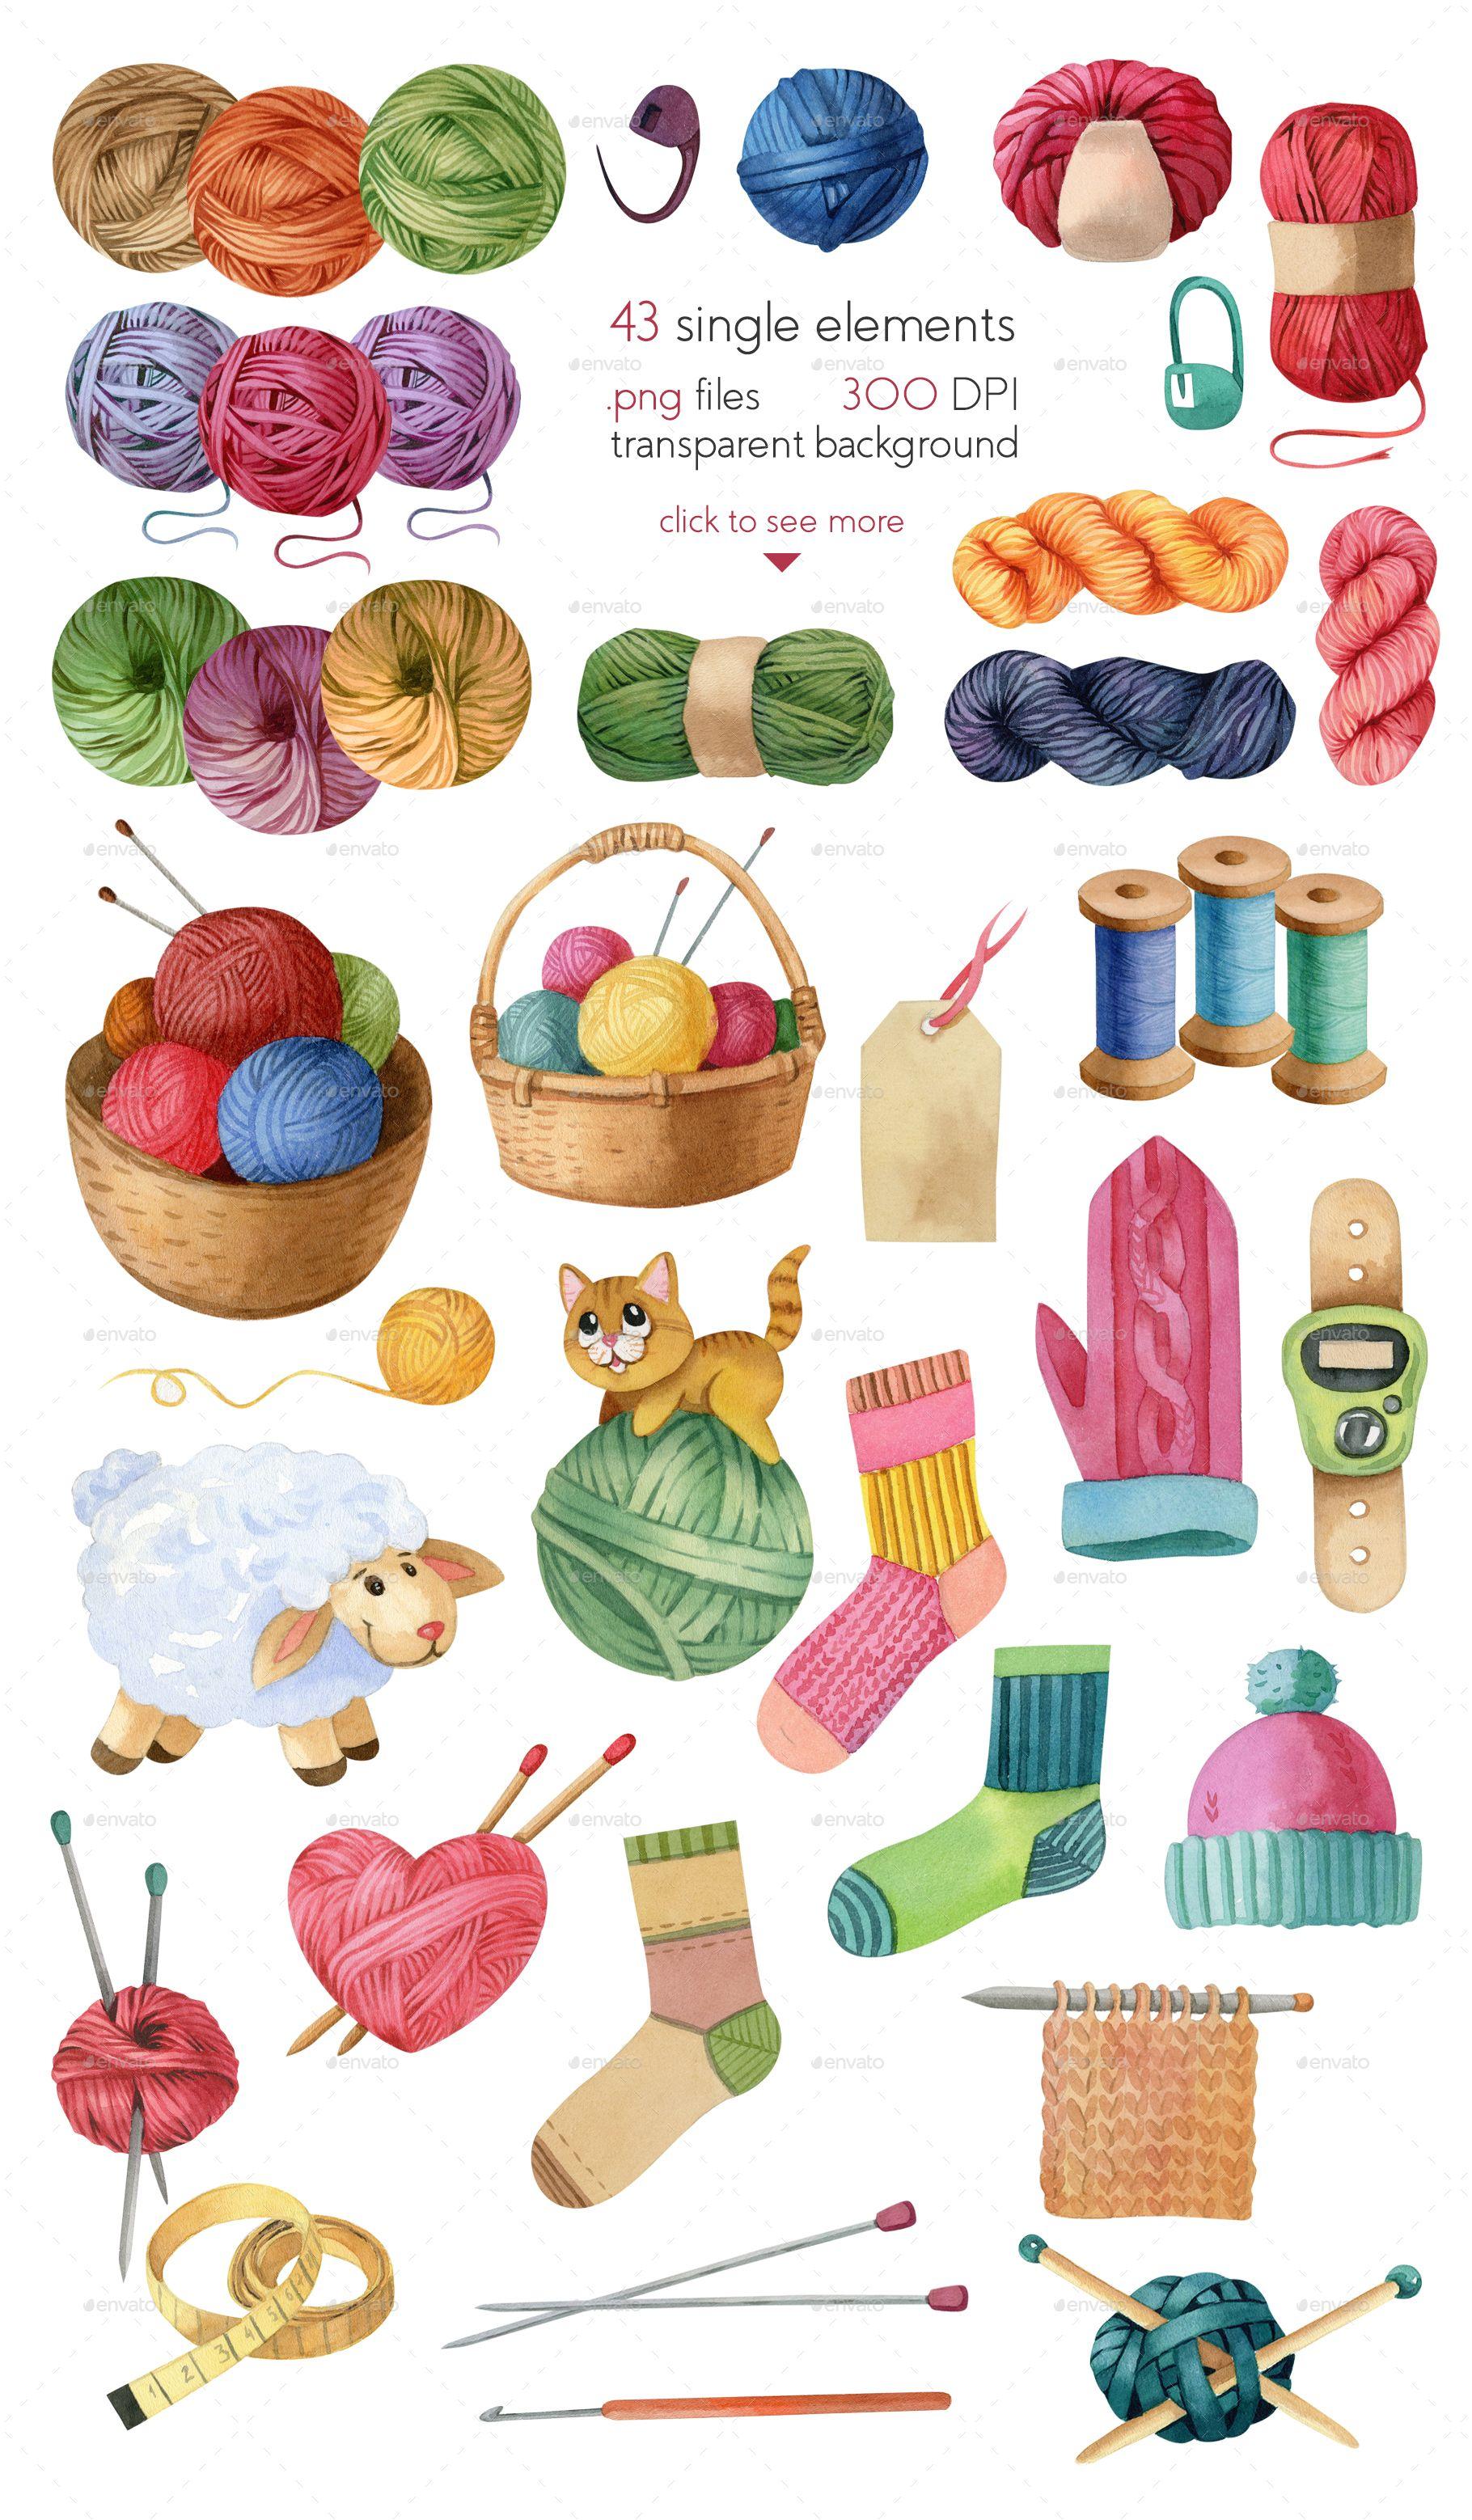 Watercolor Knitting And Crocheting Set Sewing Art Knit Art Sewing Crafts